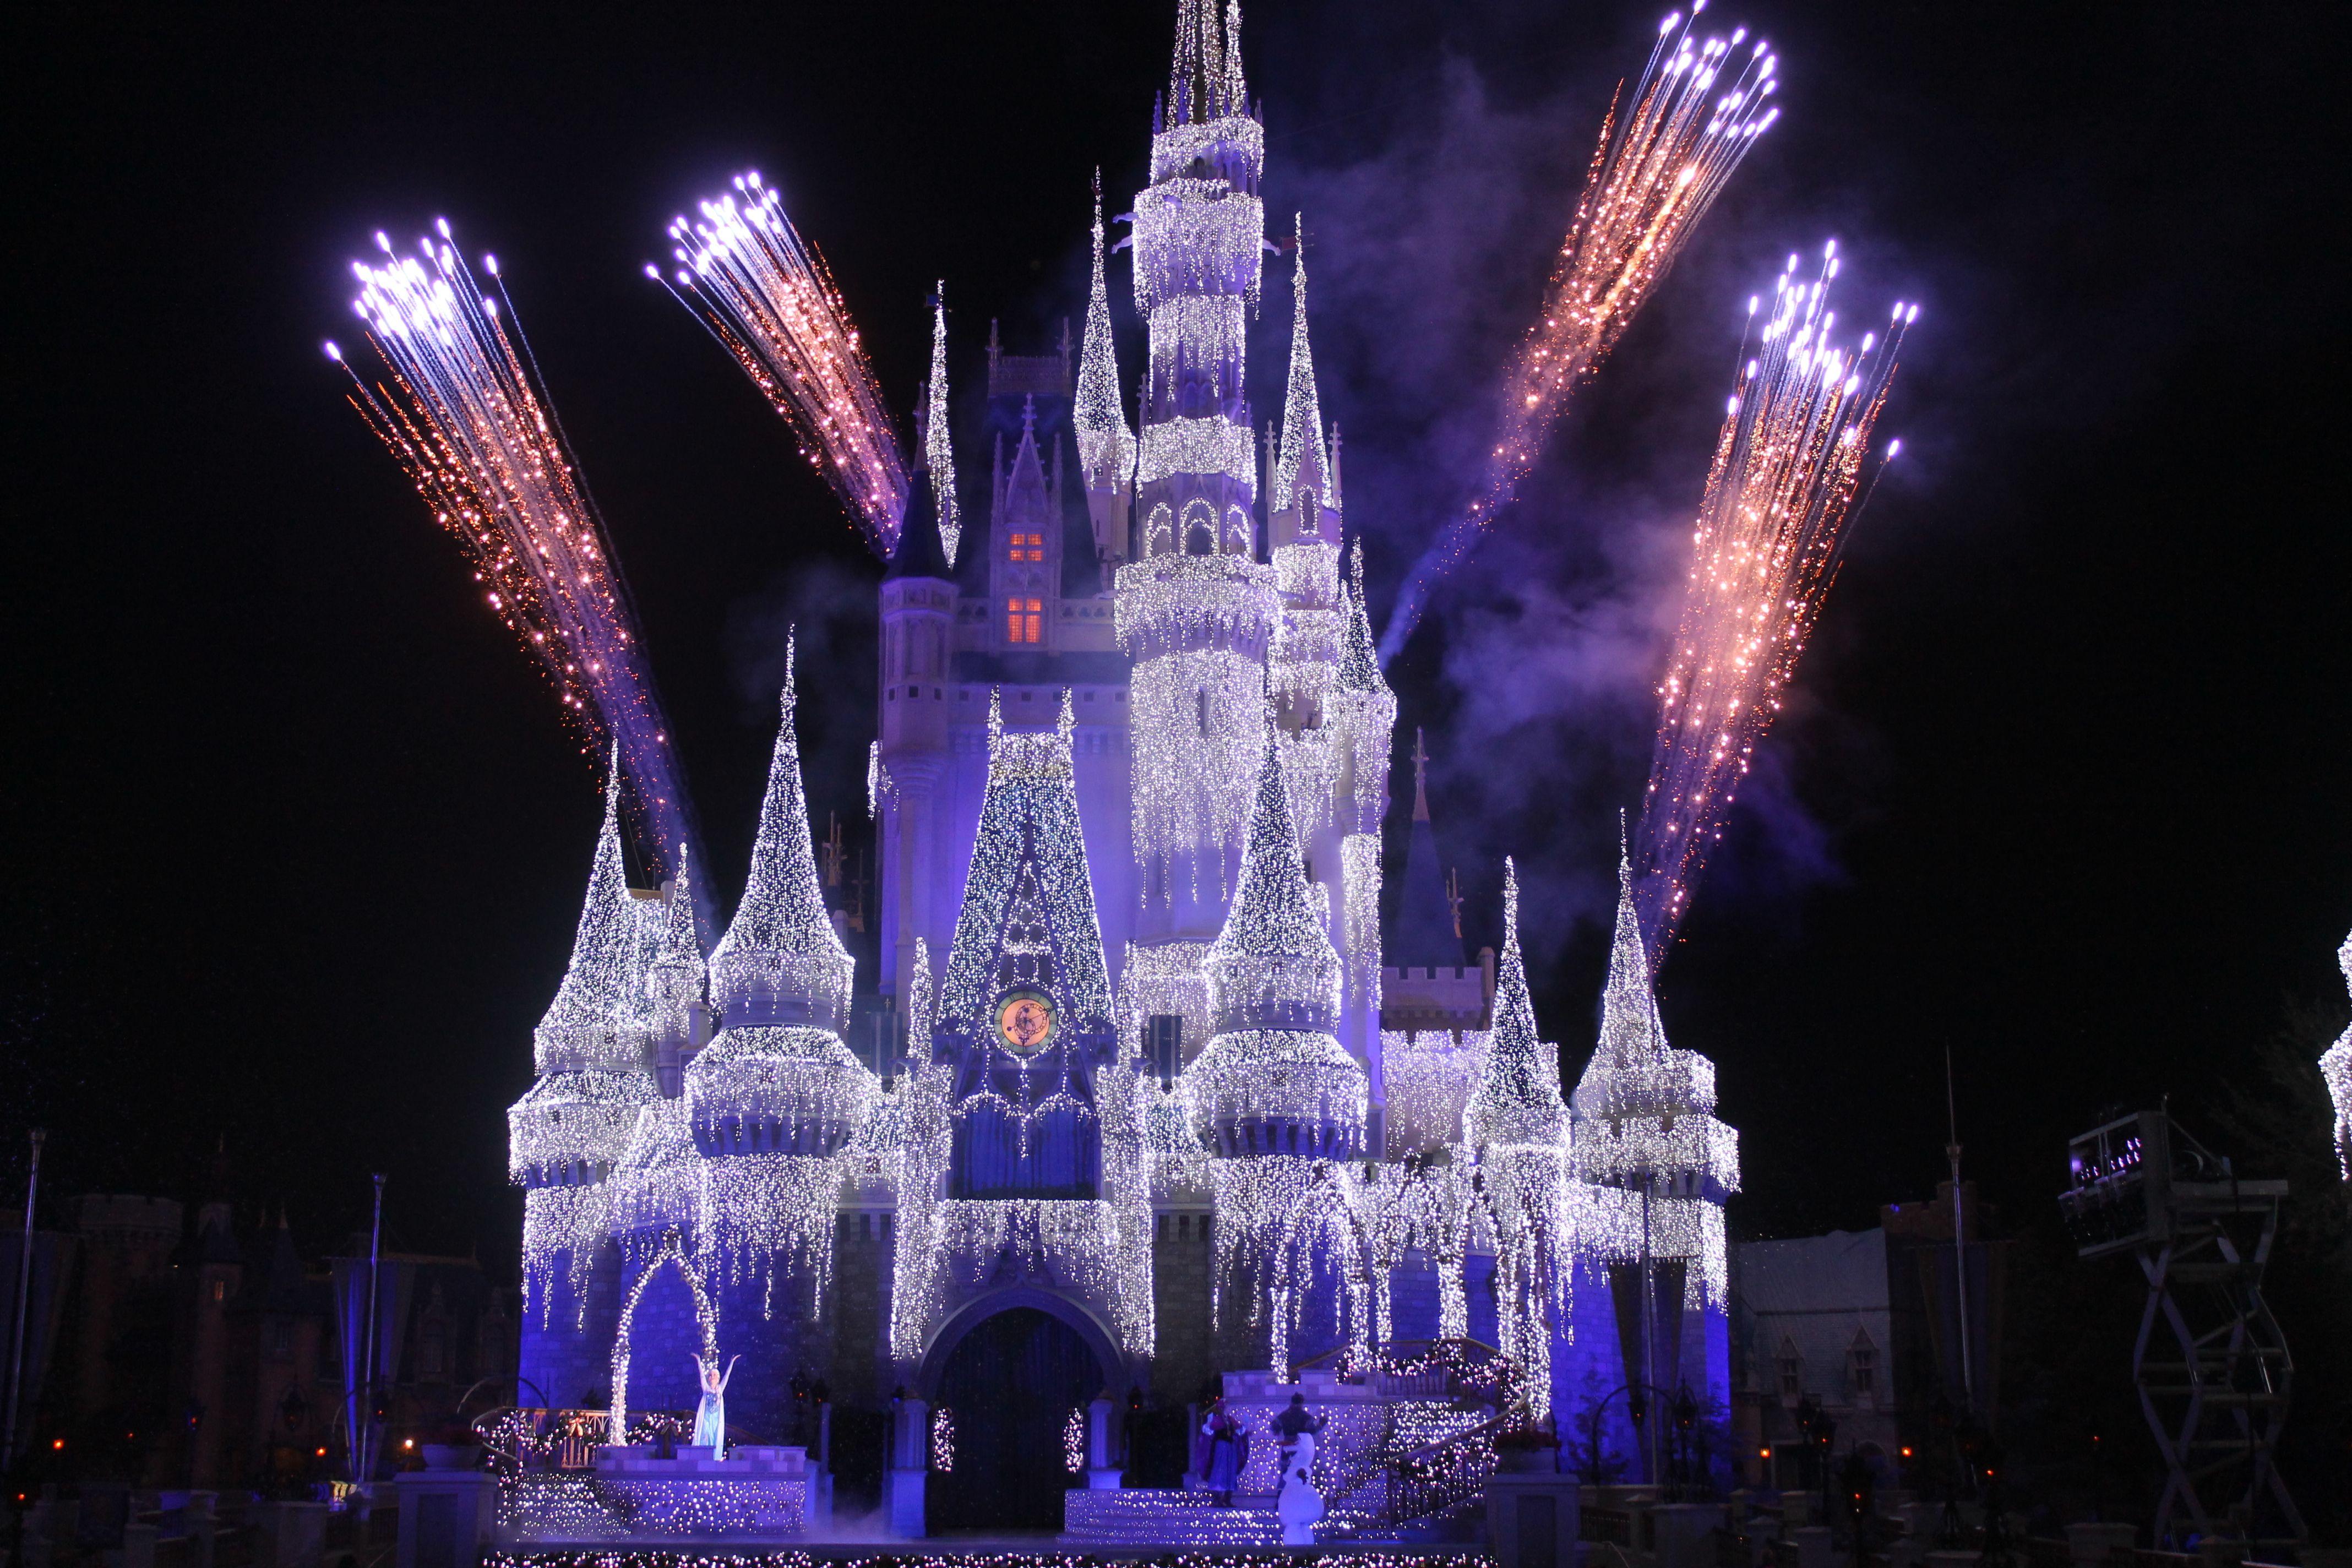 Frozen Christmas Wish at the Magic Kingdom Walt Disney World